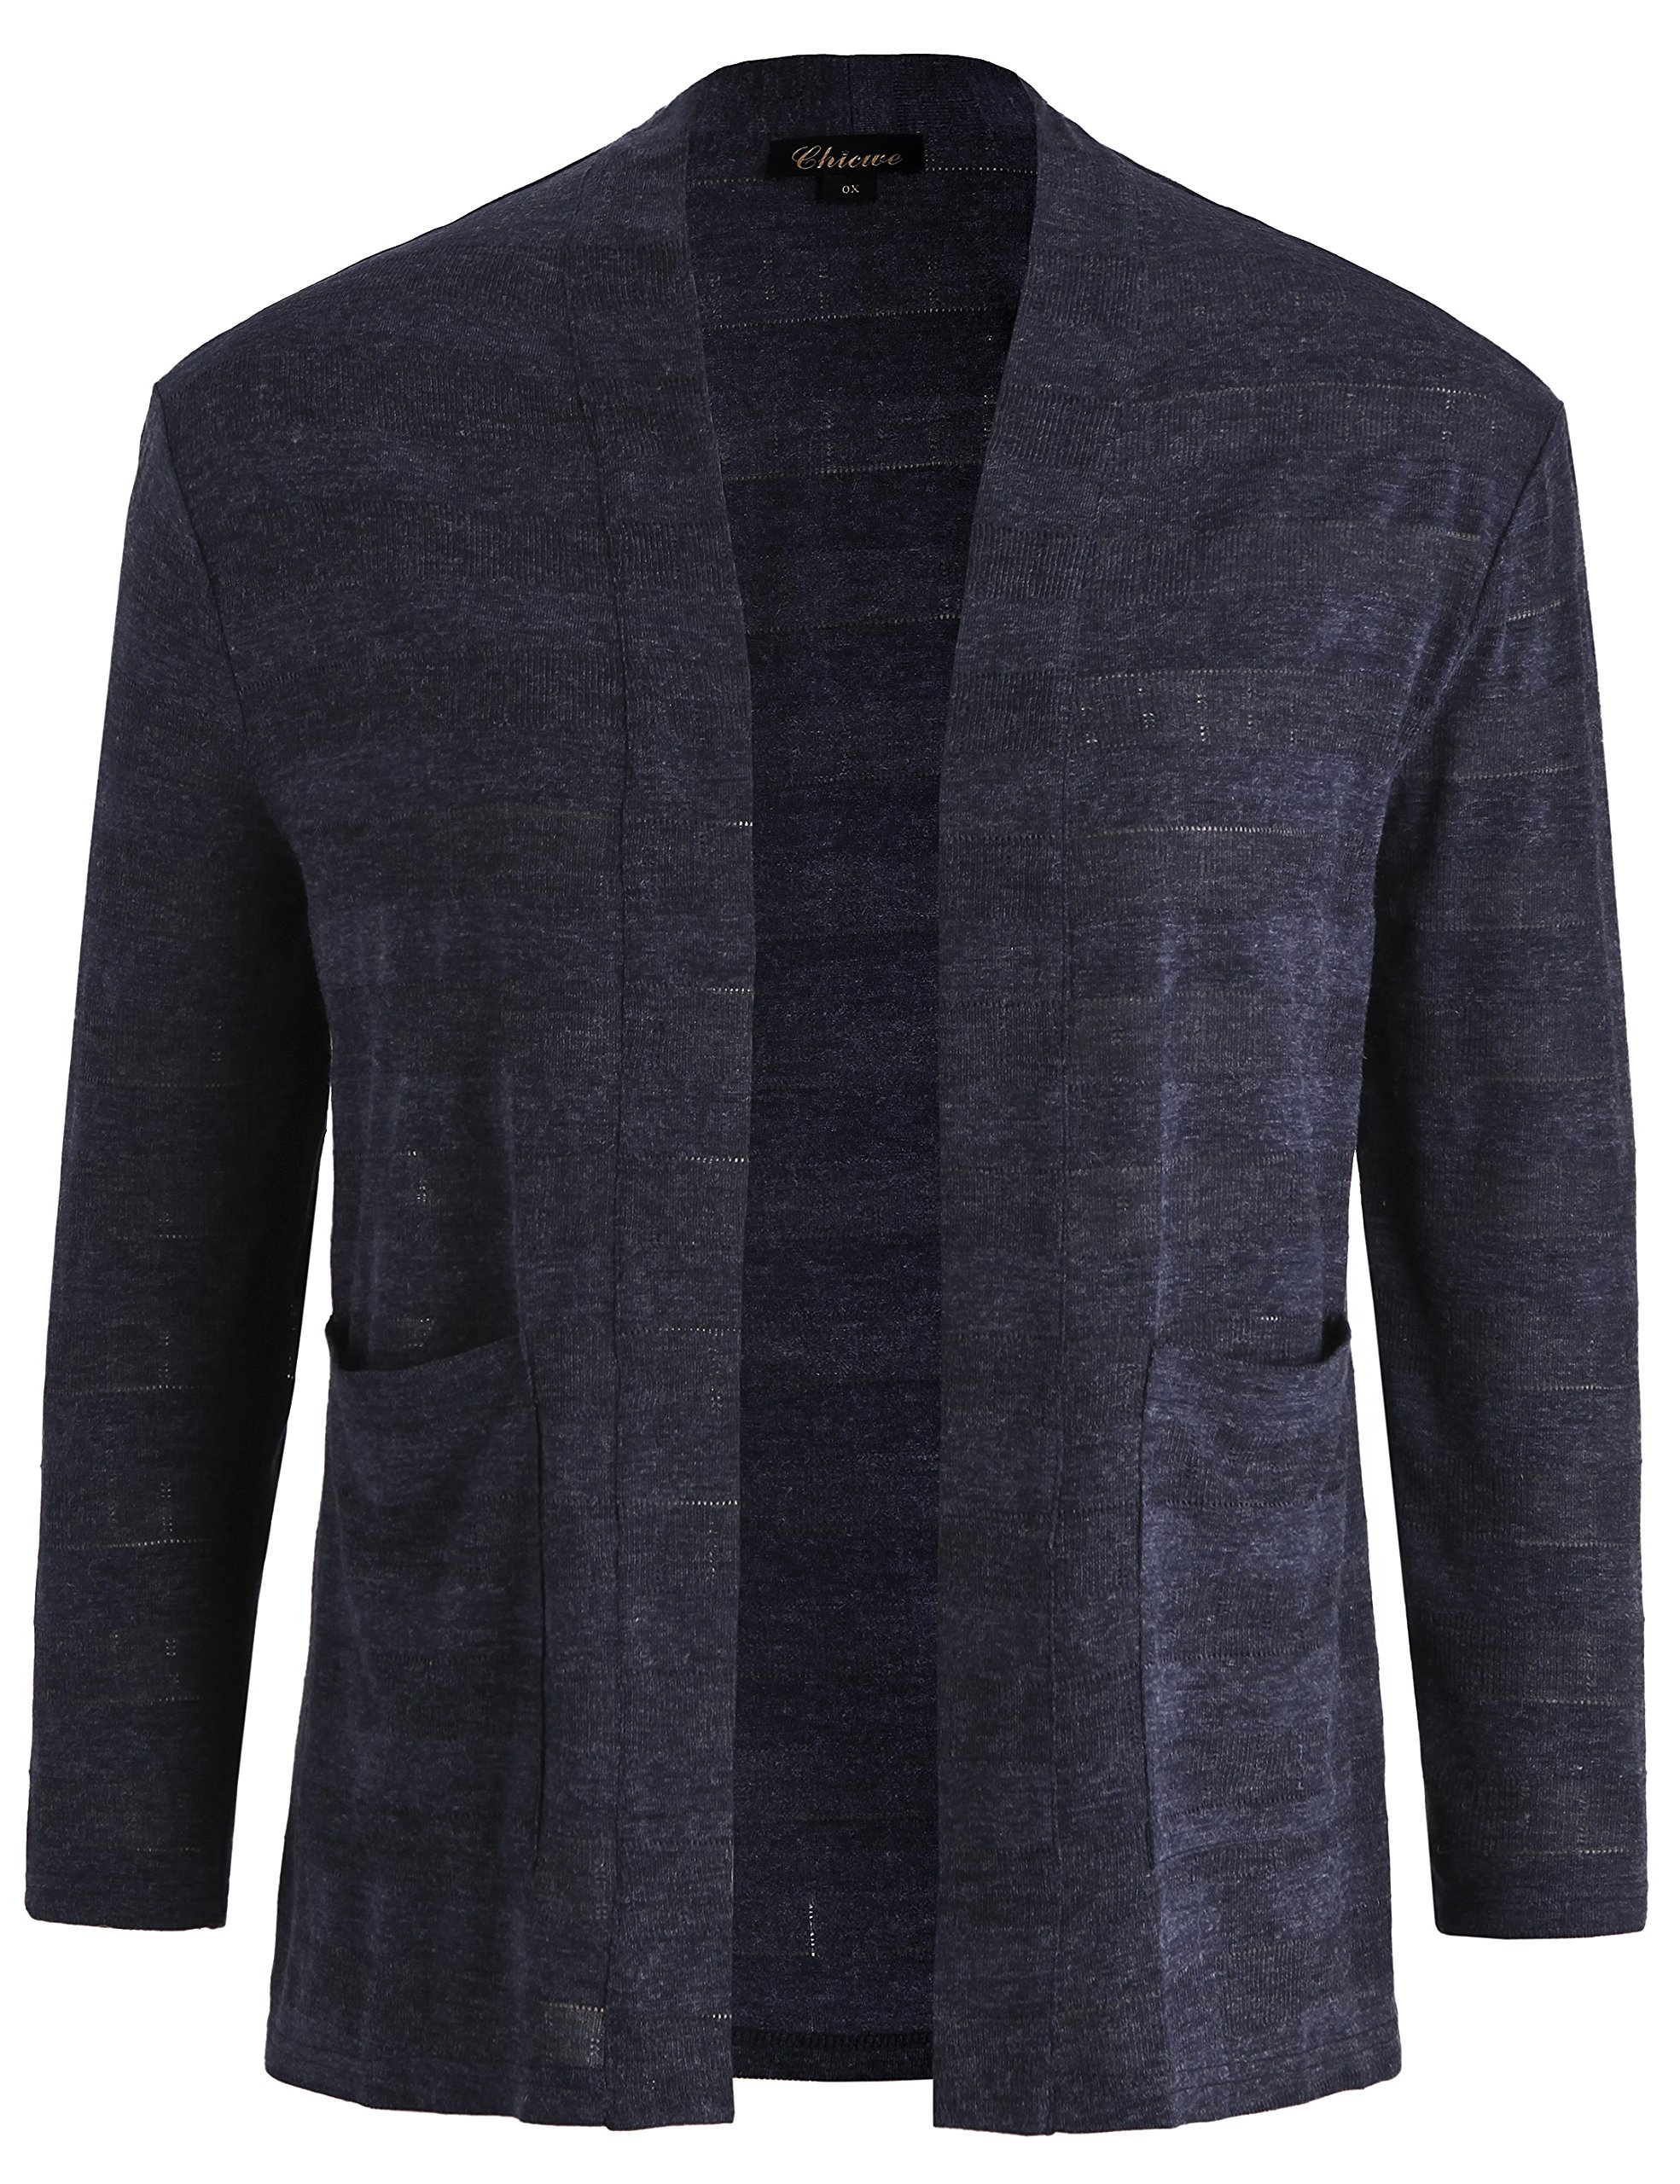 Chicwe Women's Plus Size Jacquard Cardigan Jacket - Casual and Work Blazer 4X